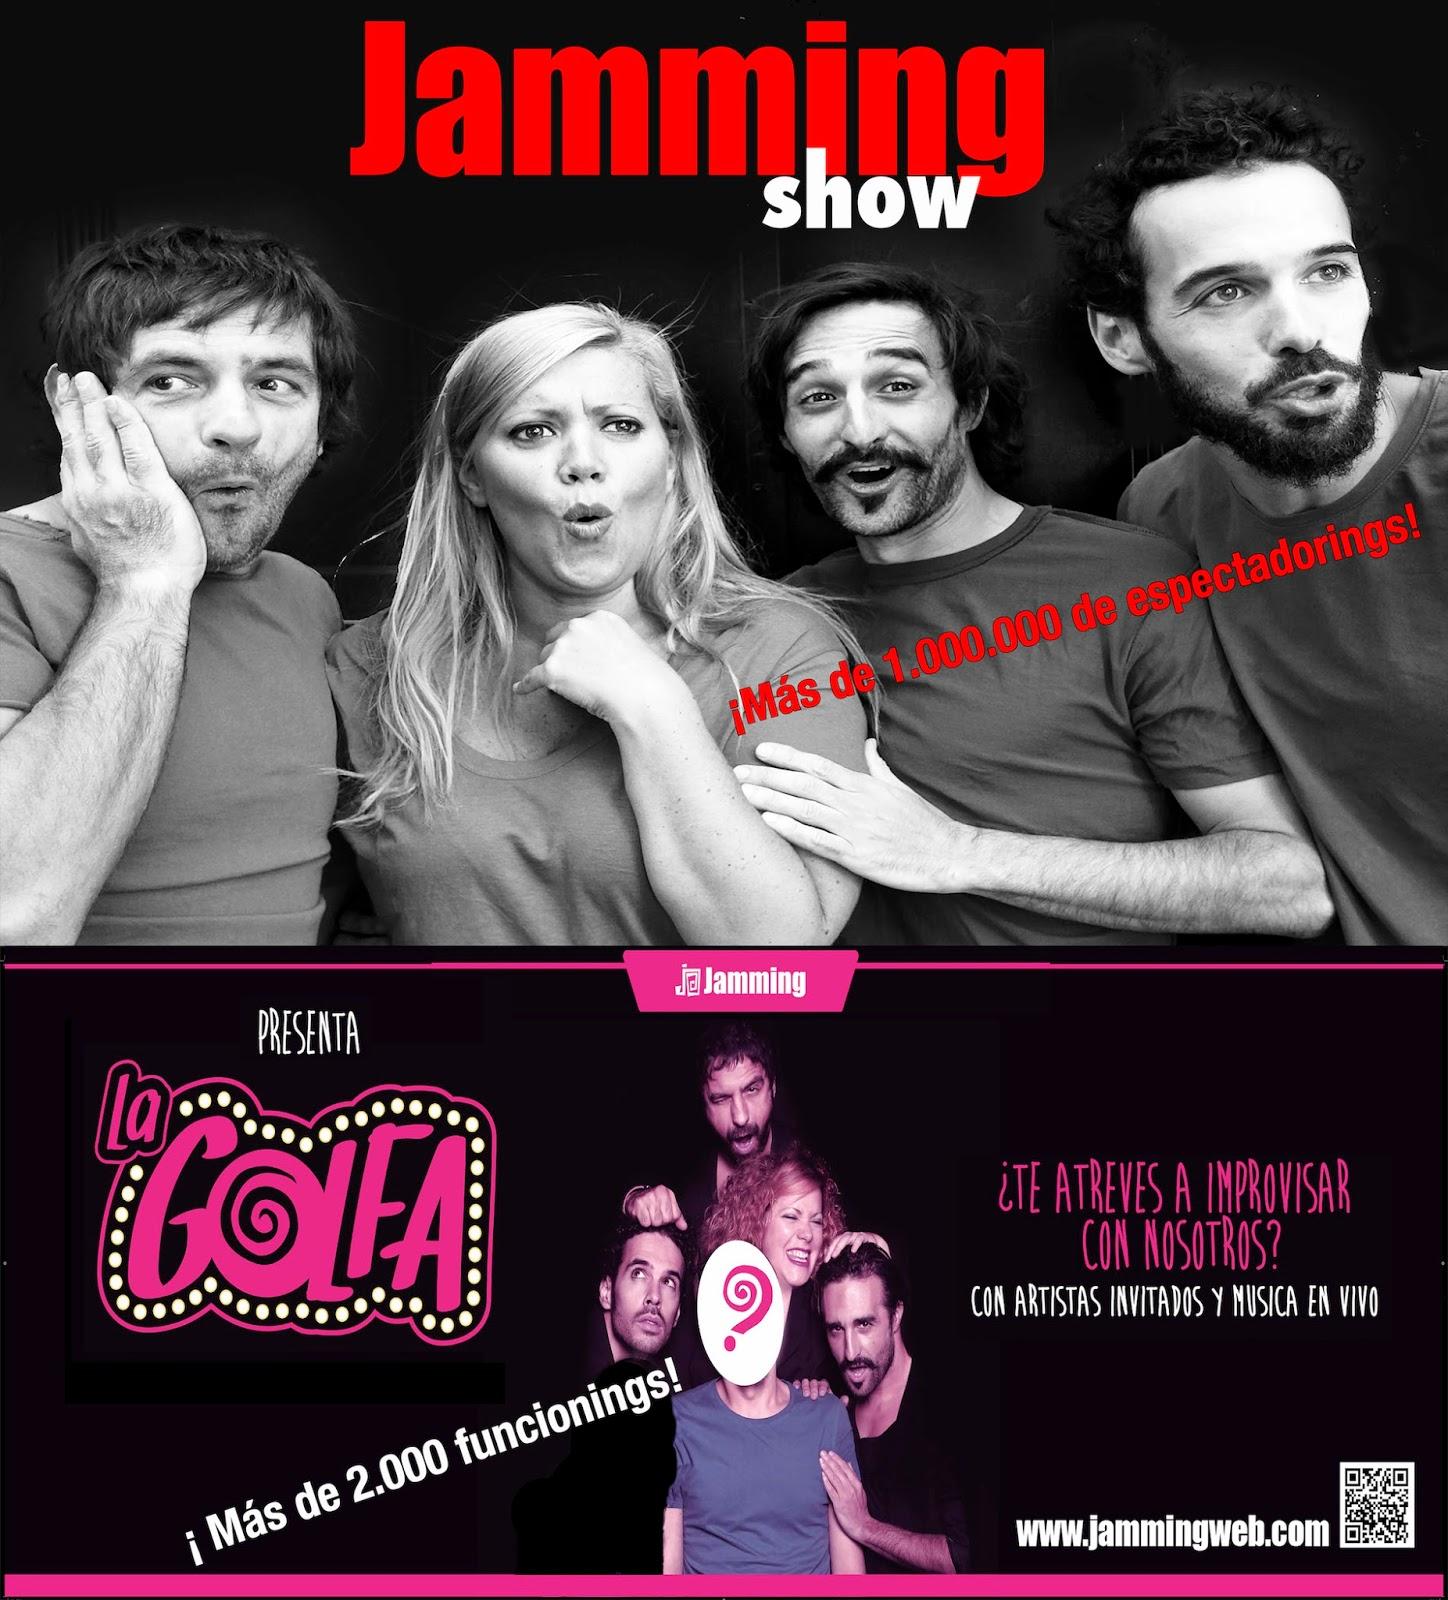 teatro-improvisacion-madrid-mejores-obras-cartelera